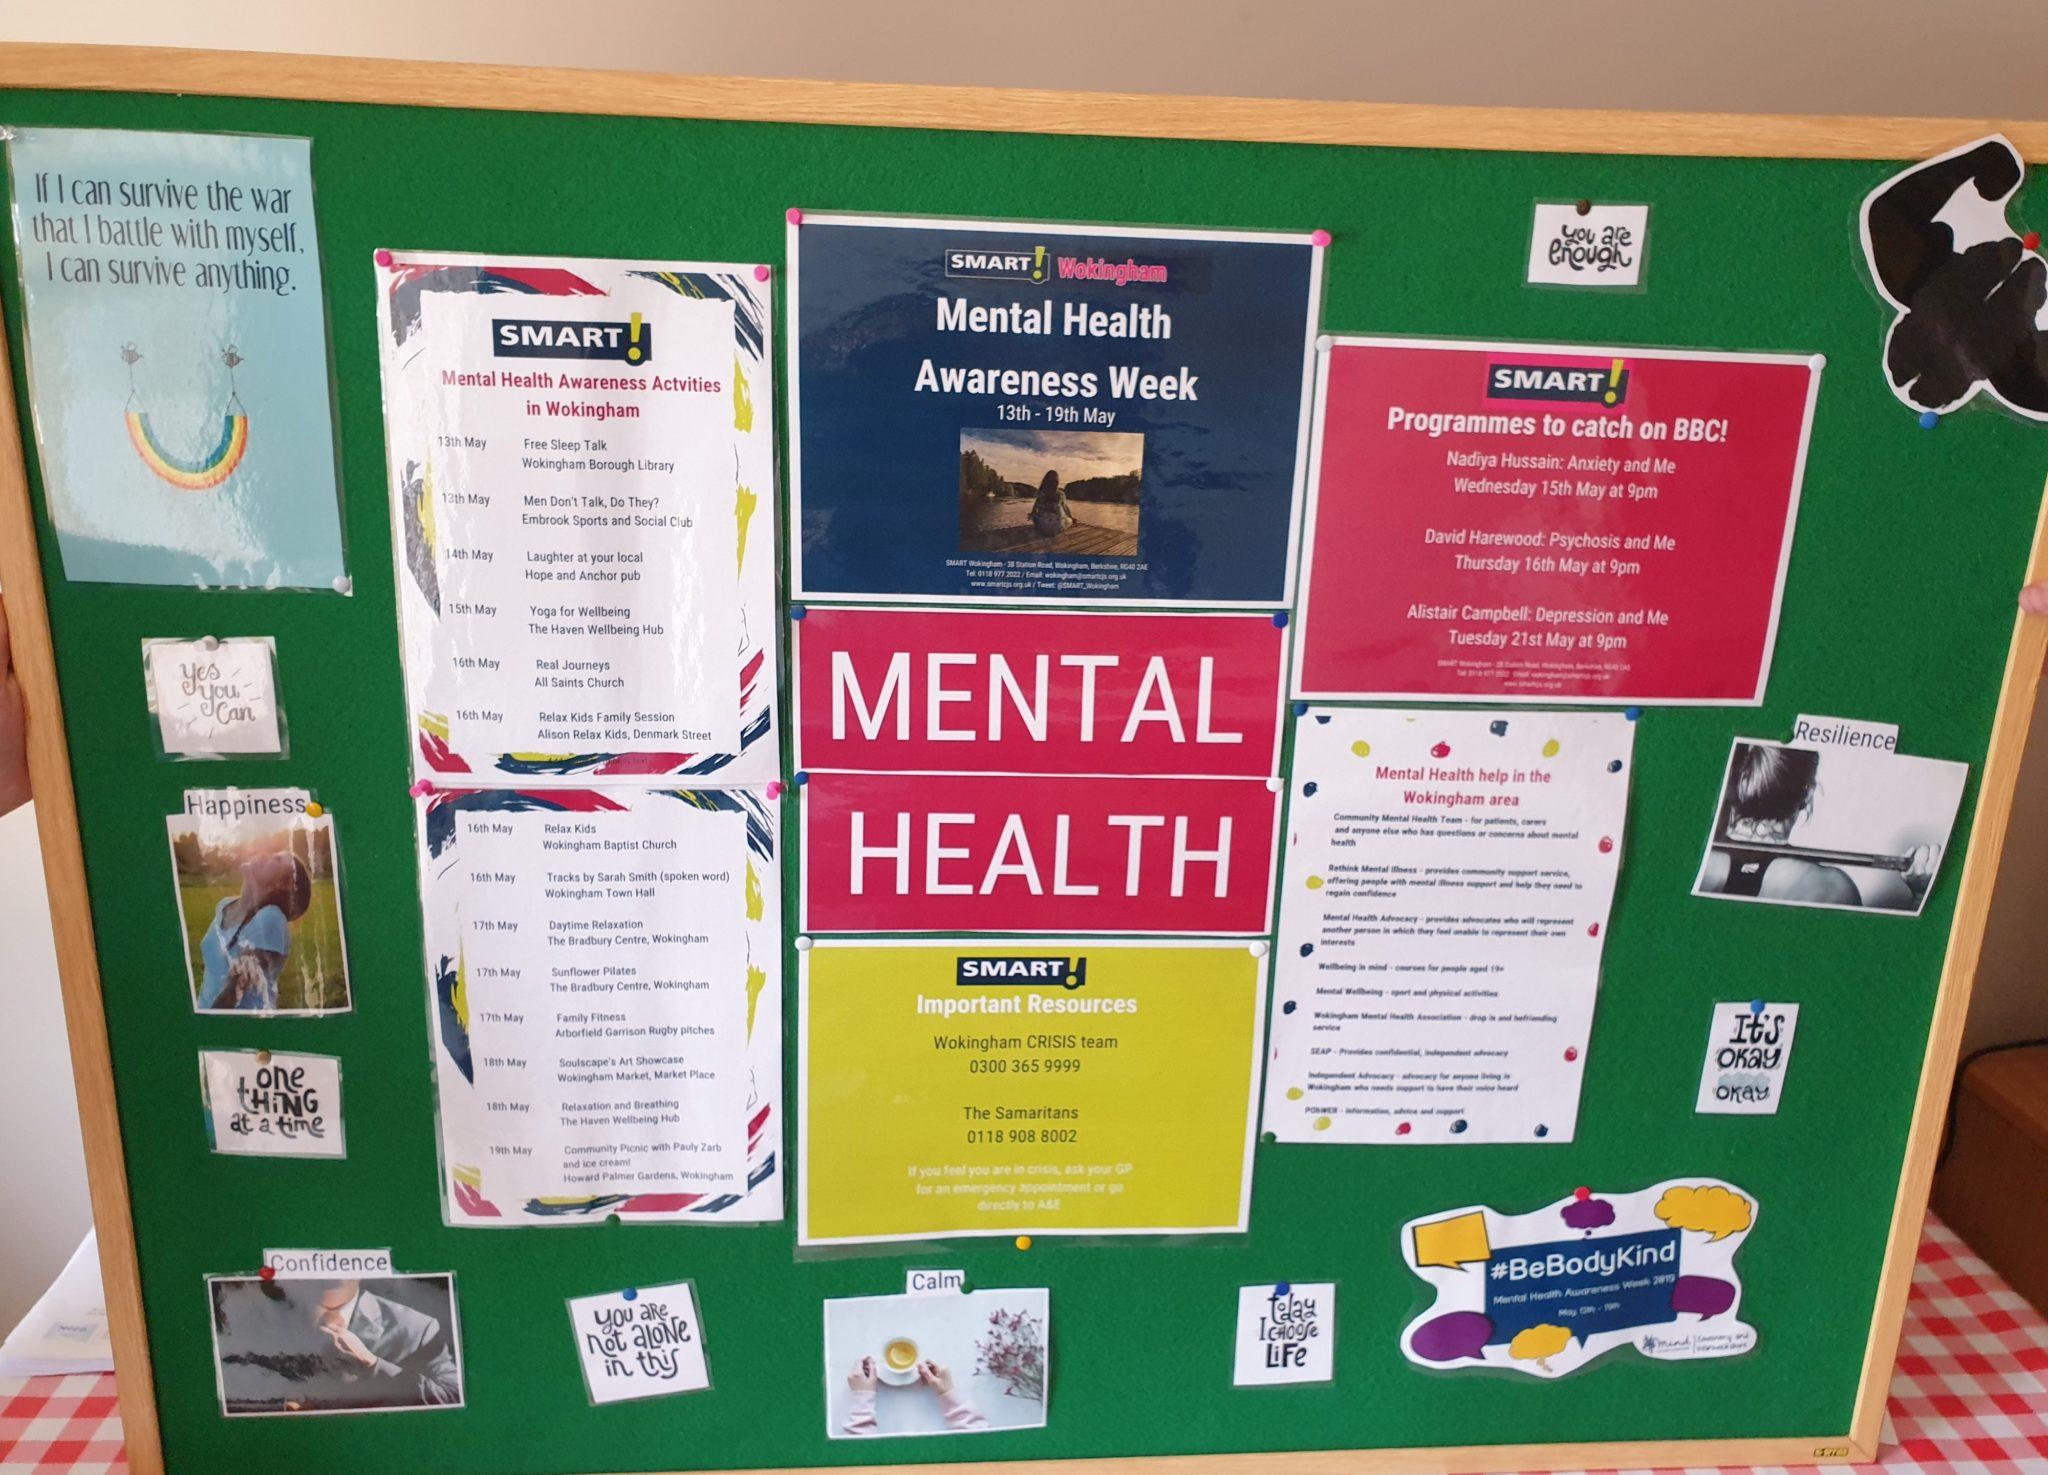 mental health awareness week - photo #19